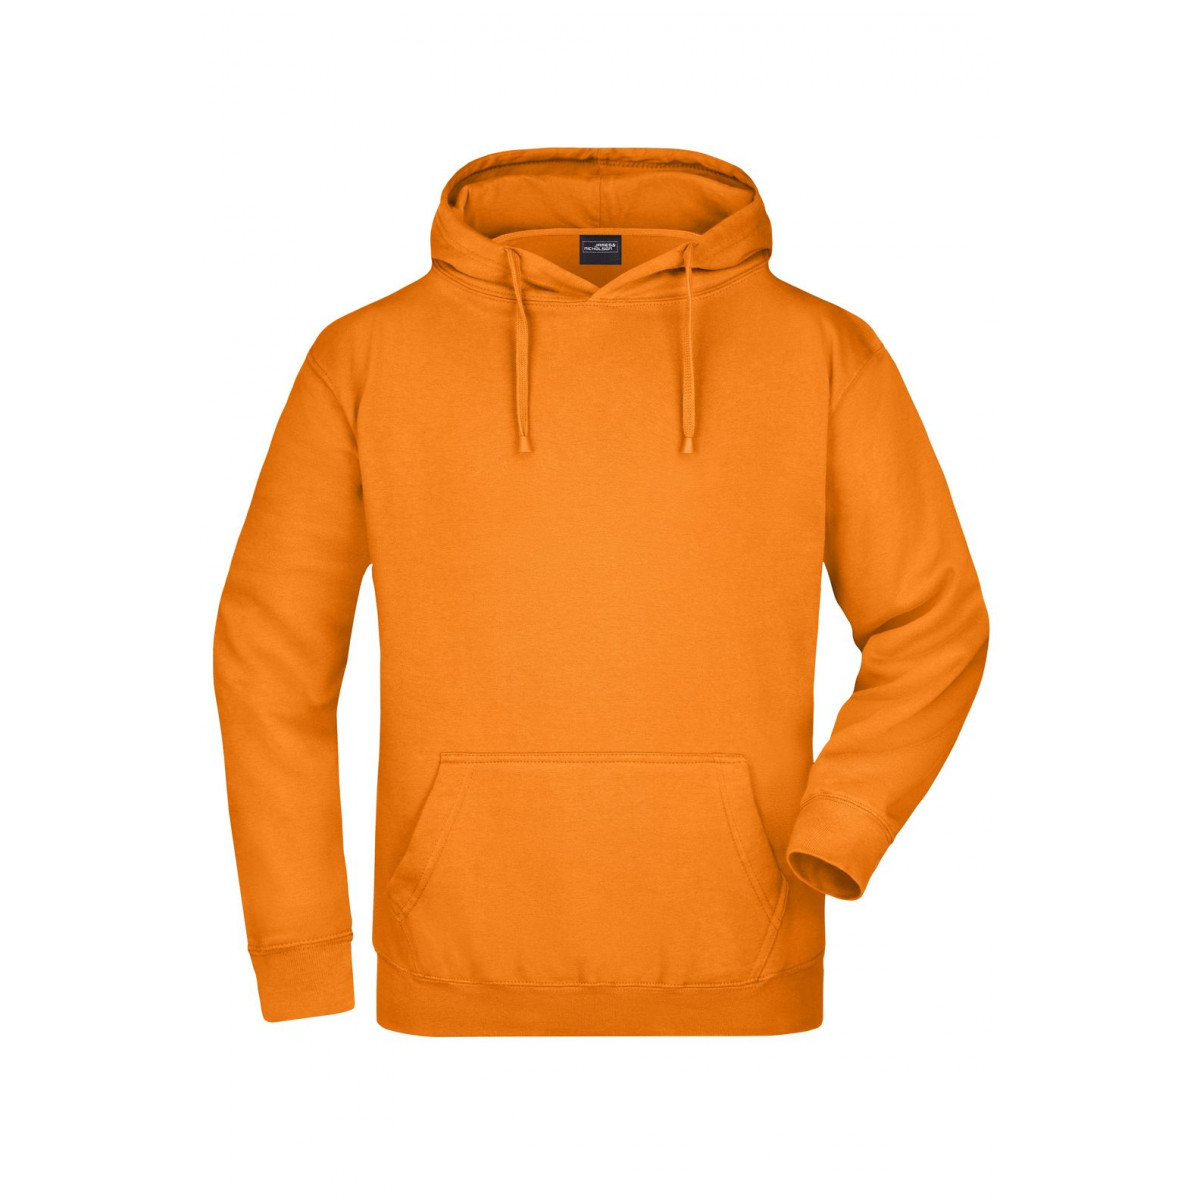 Толстовка мужская JN047 Hooded Sweat - Оранжевый